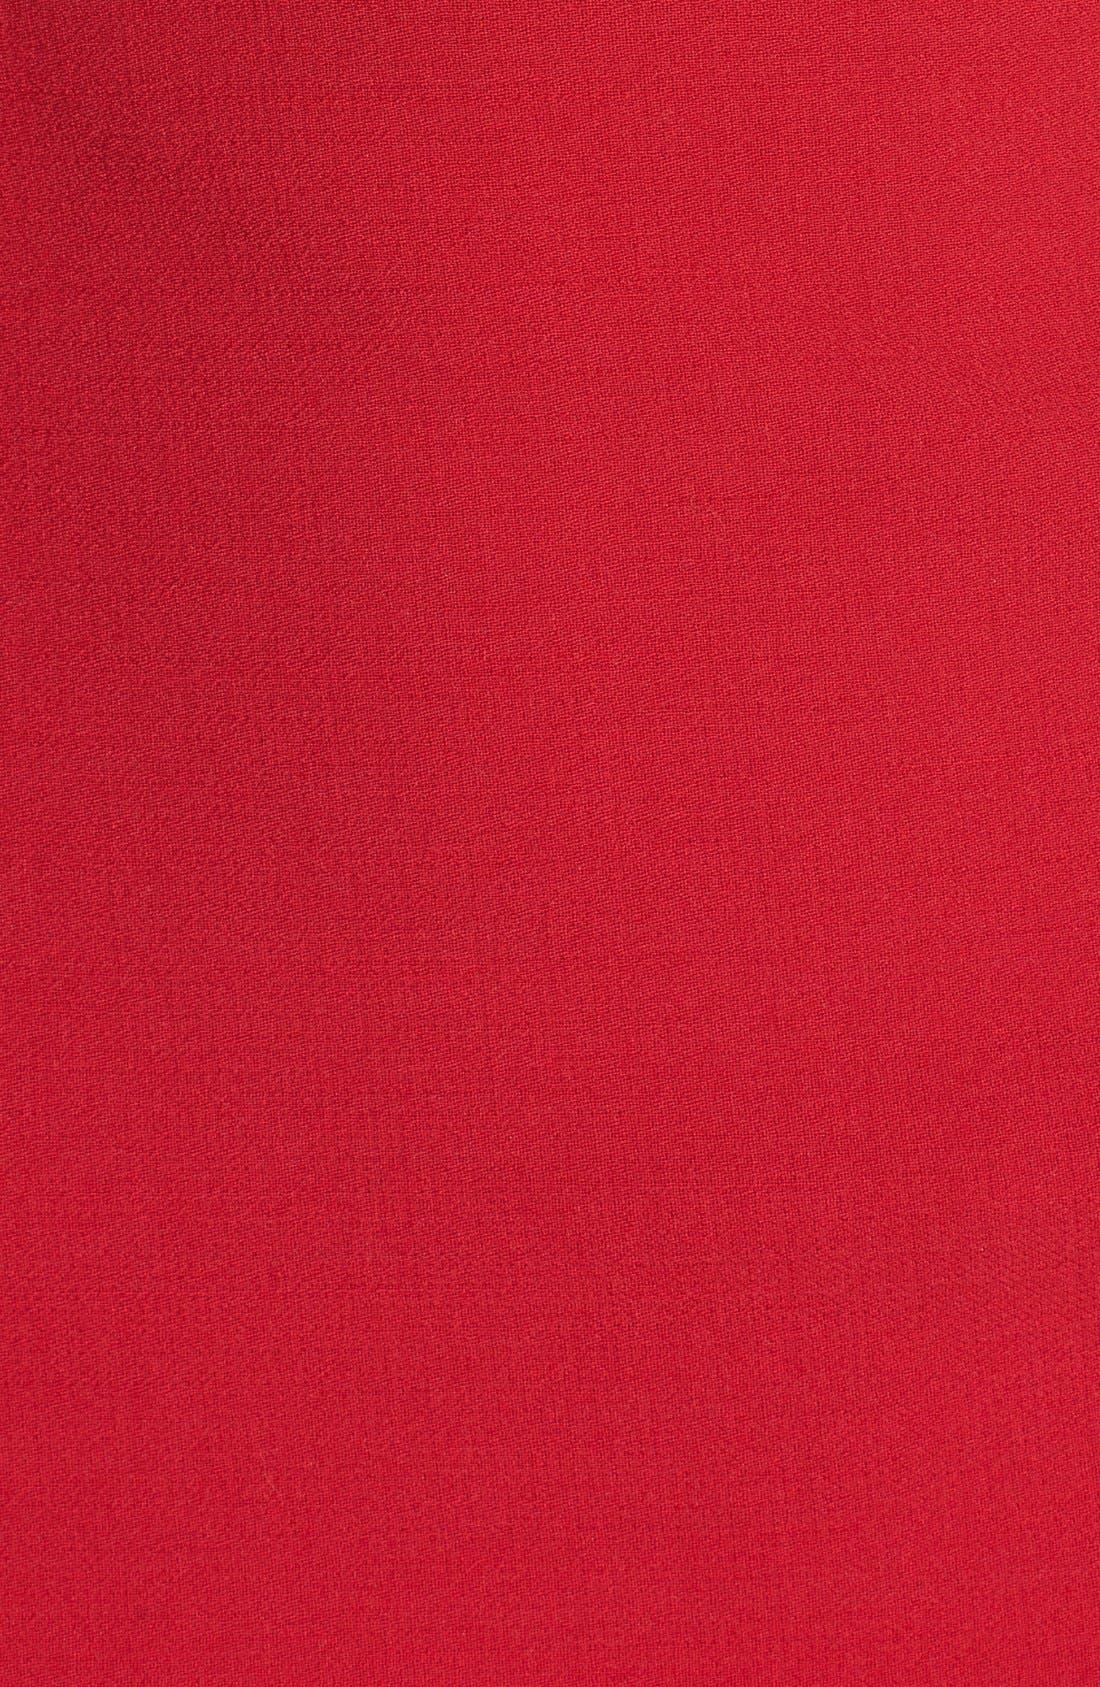 Alternate Image 3  - Dolce&Gabbana Square Neck Wool Crepe Dress